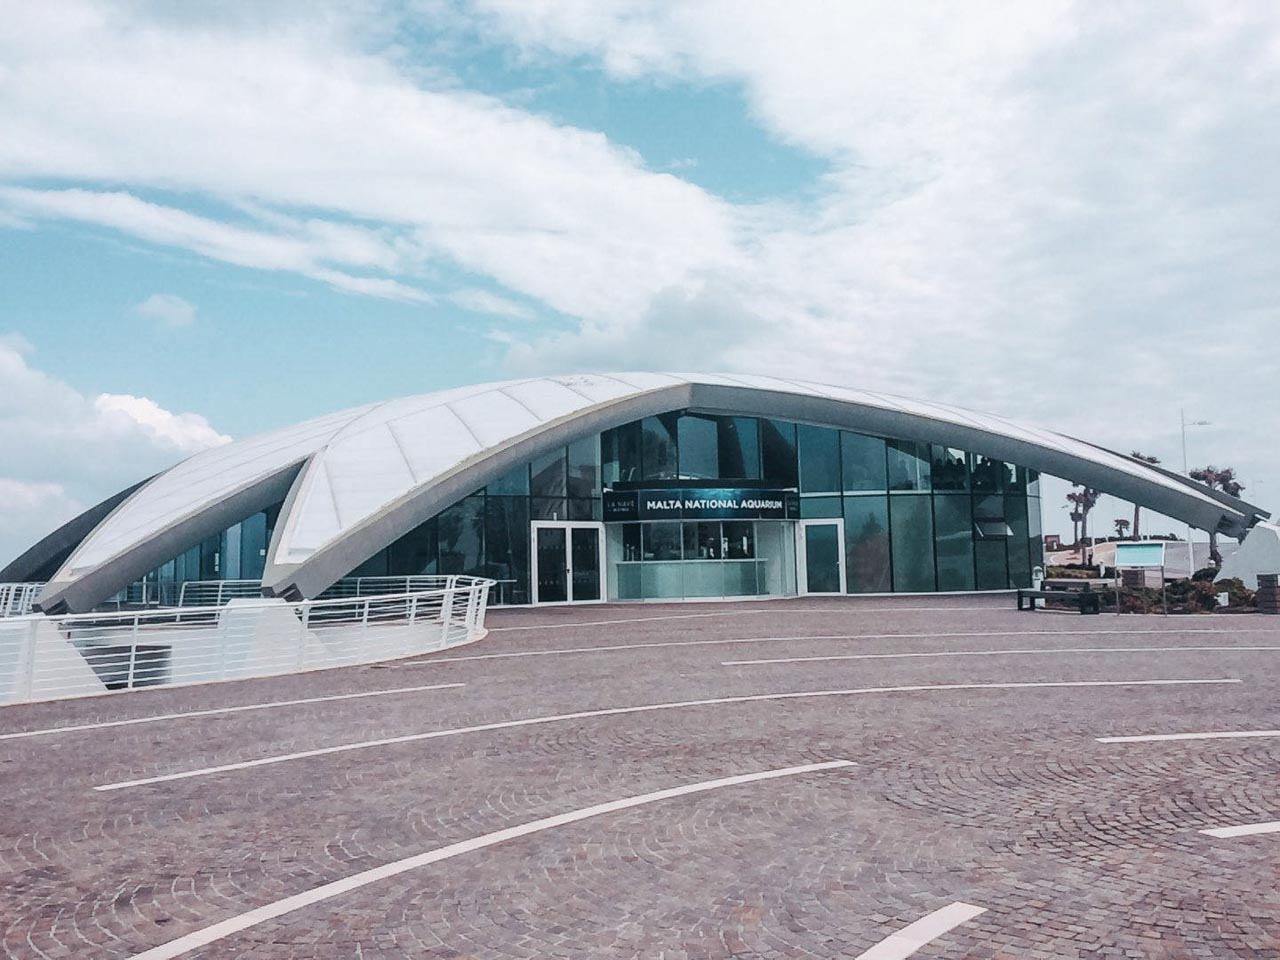 The starfish-shaped building of Malta National Aquarium